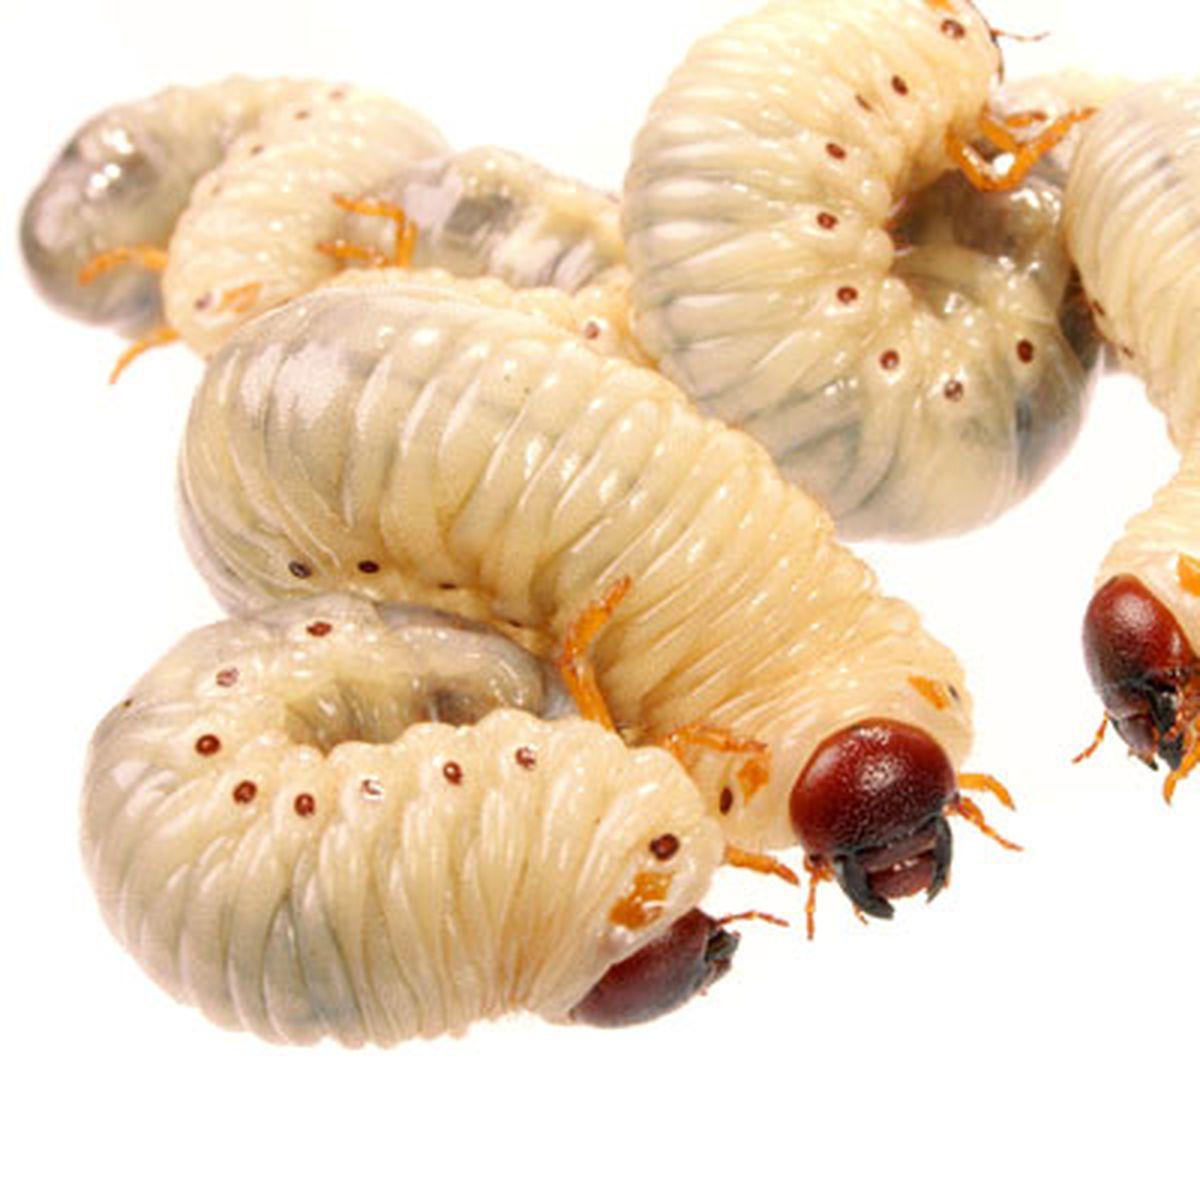 tratament pentru vierme și viermi papillary urothelial neoplasm treatment